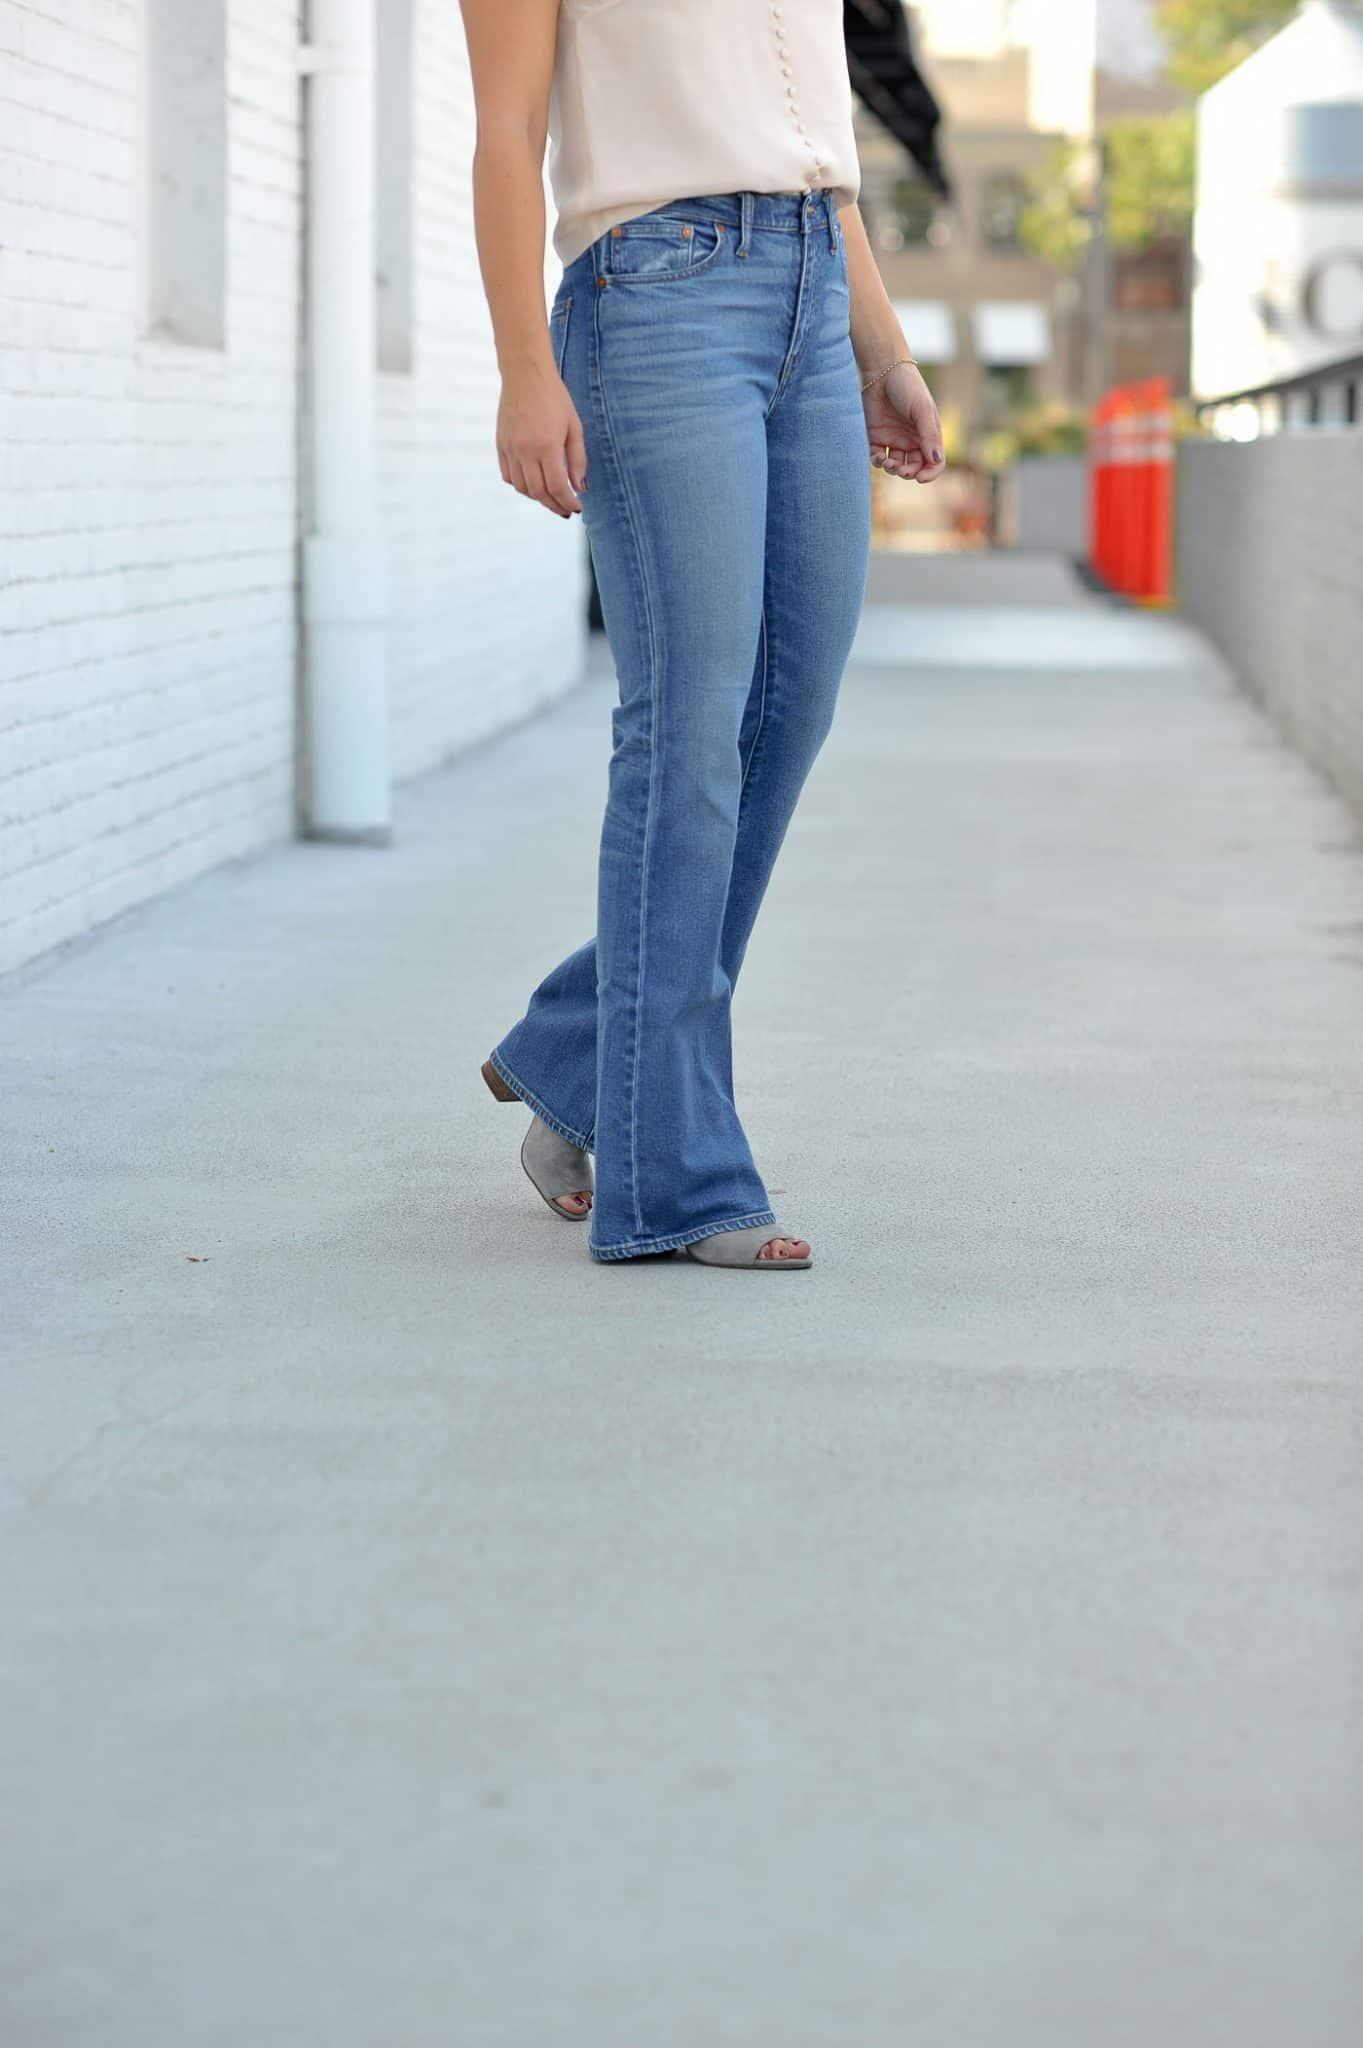 Millennial pink outfit idea, blush button down camisole, wide leg jeans - My Style Vita @mystylevita